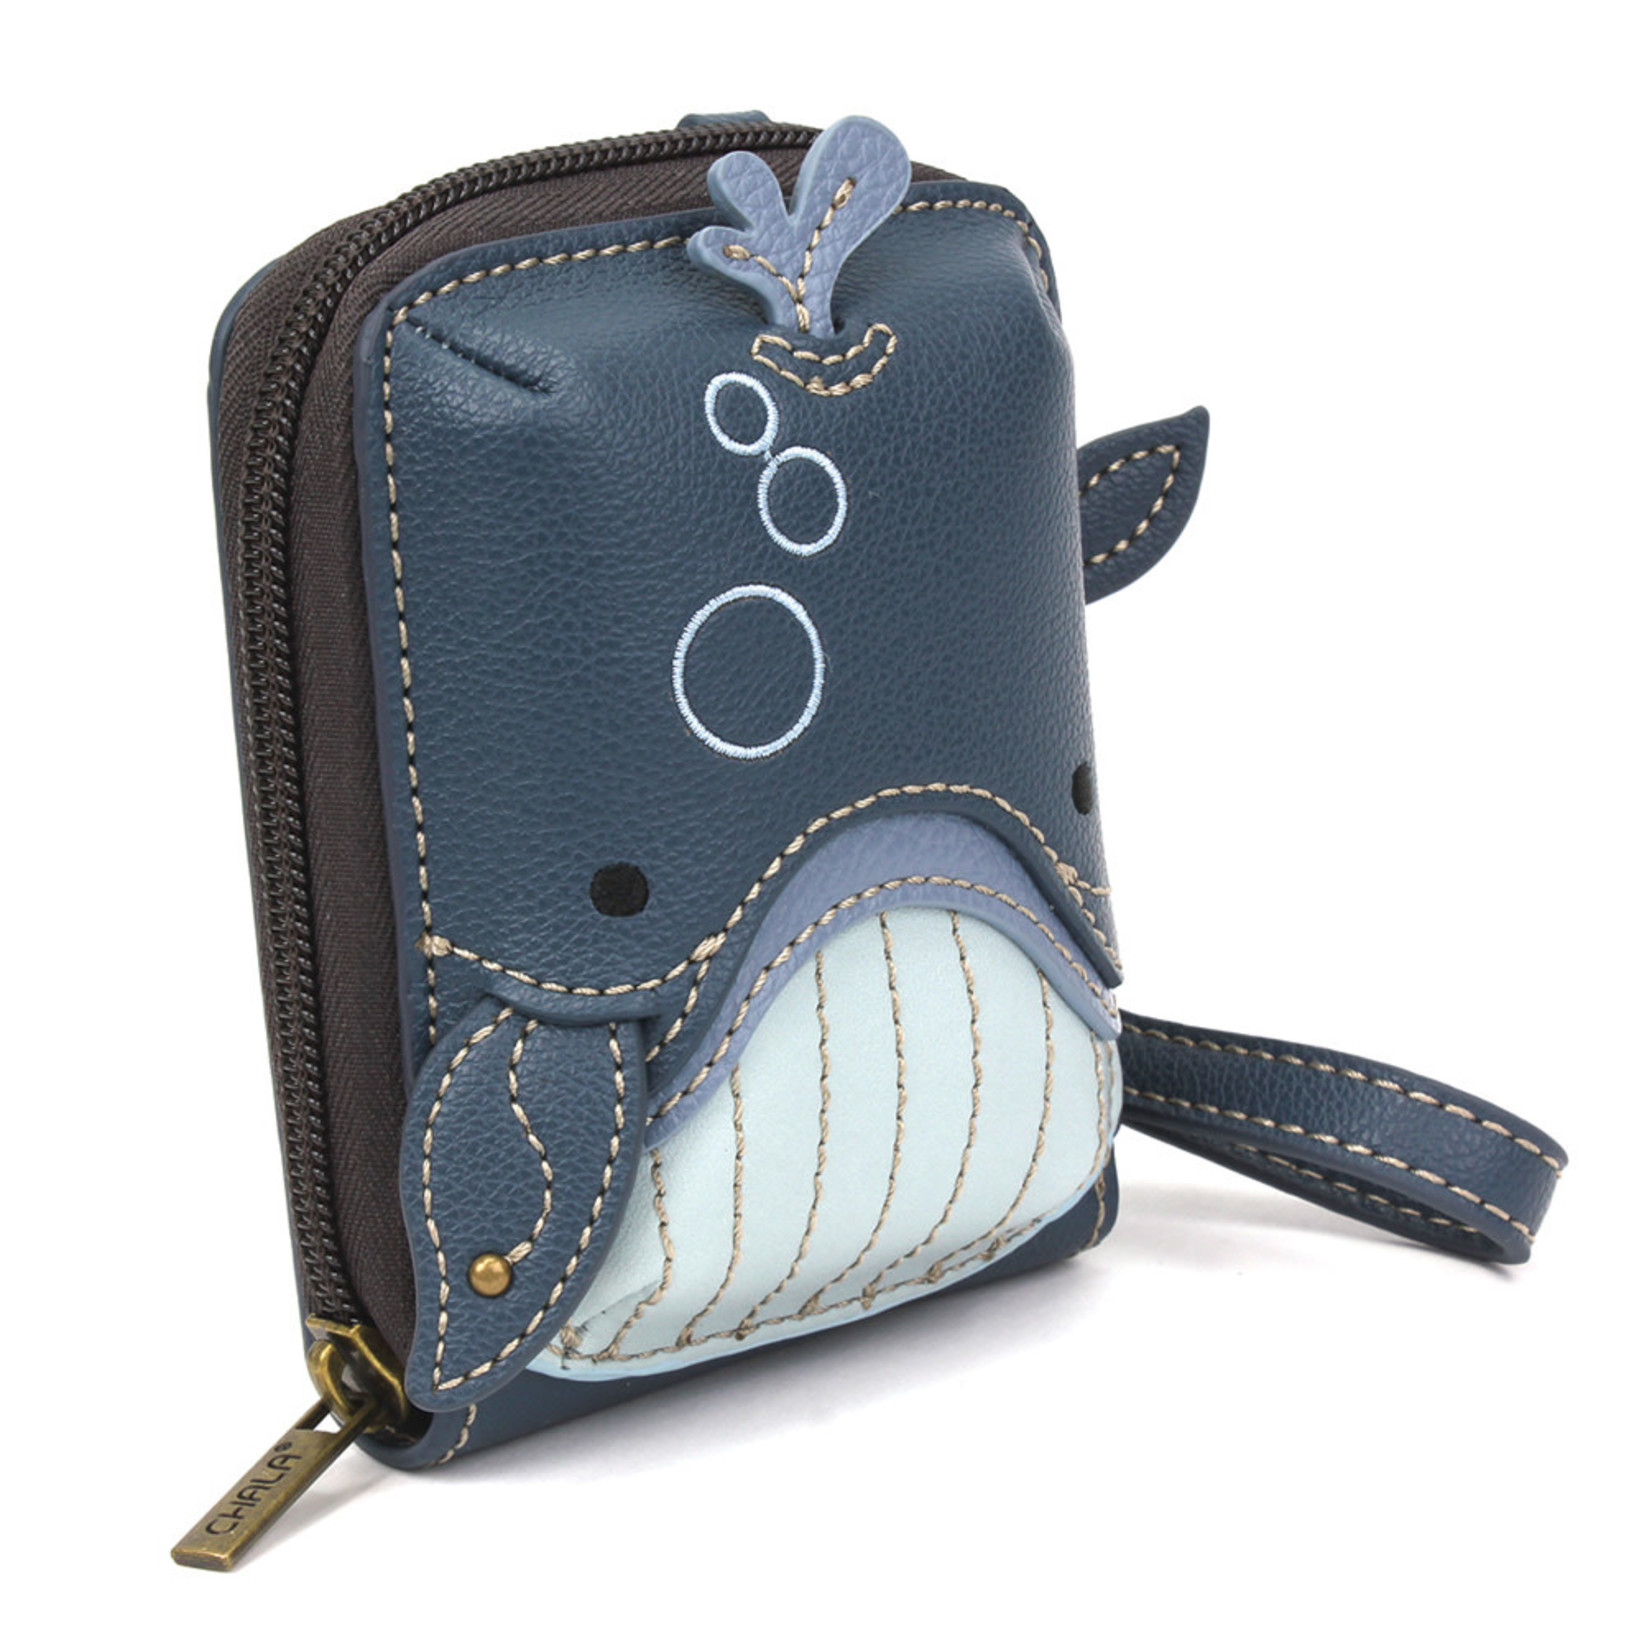 Chala Cute-C Credit Card Holder Wristlet:  Whale